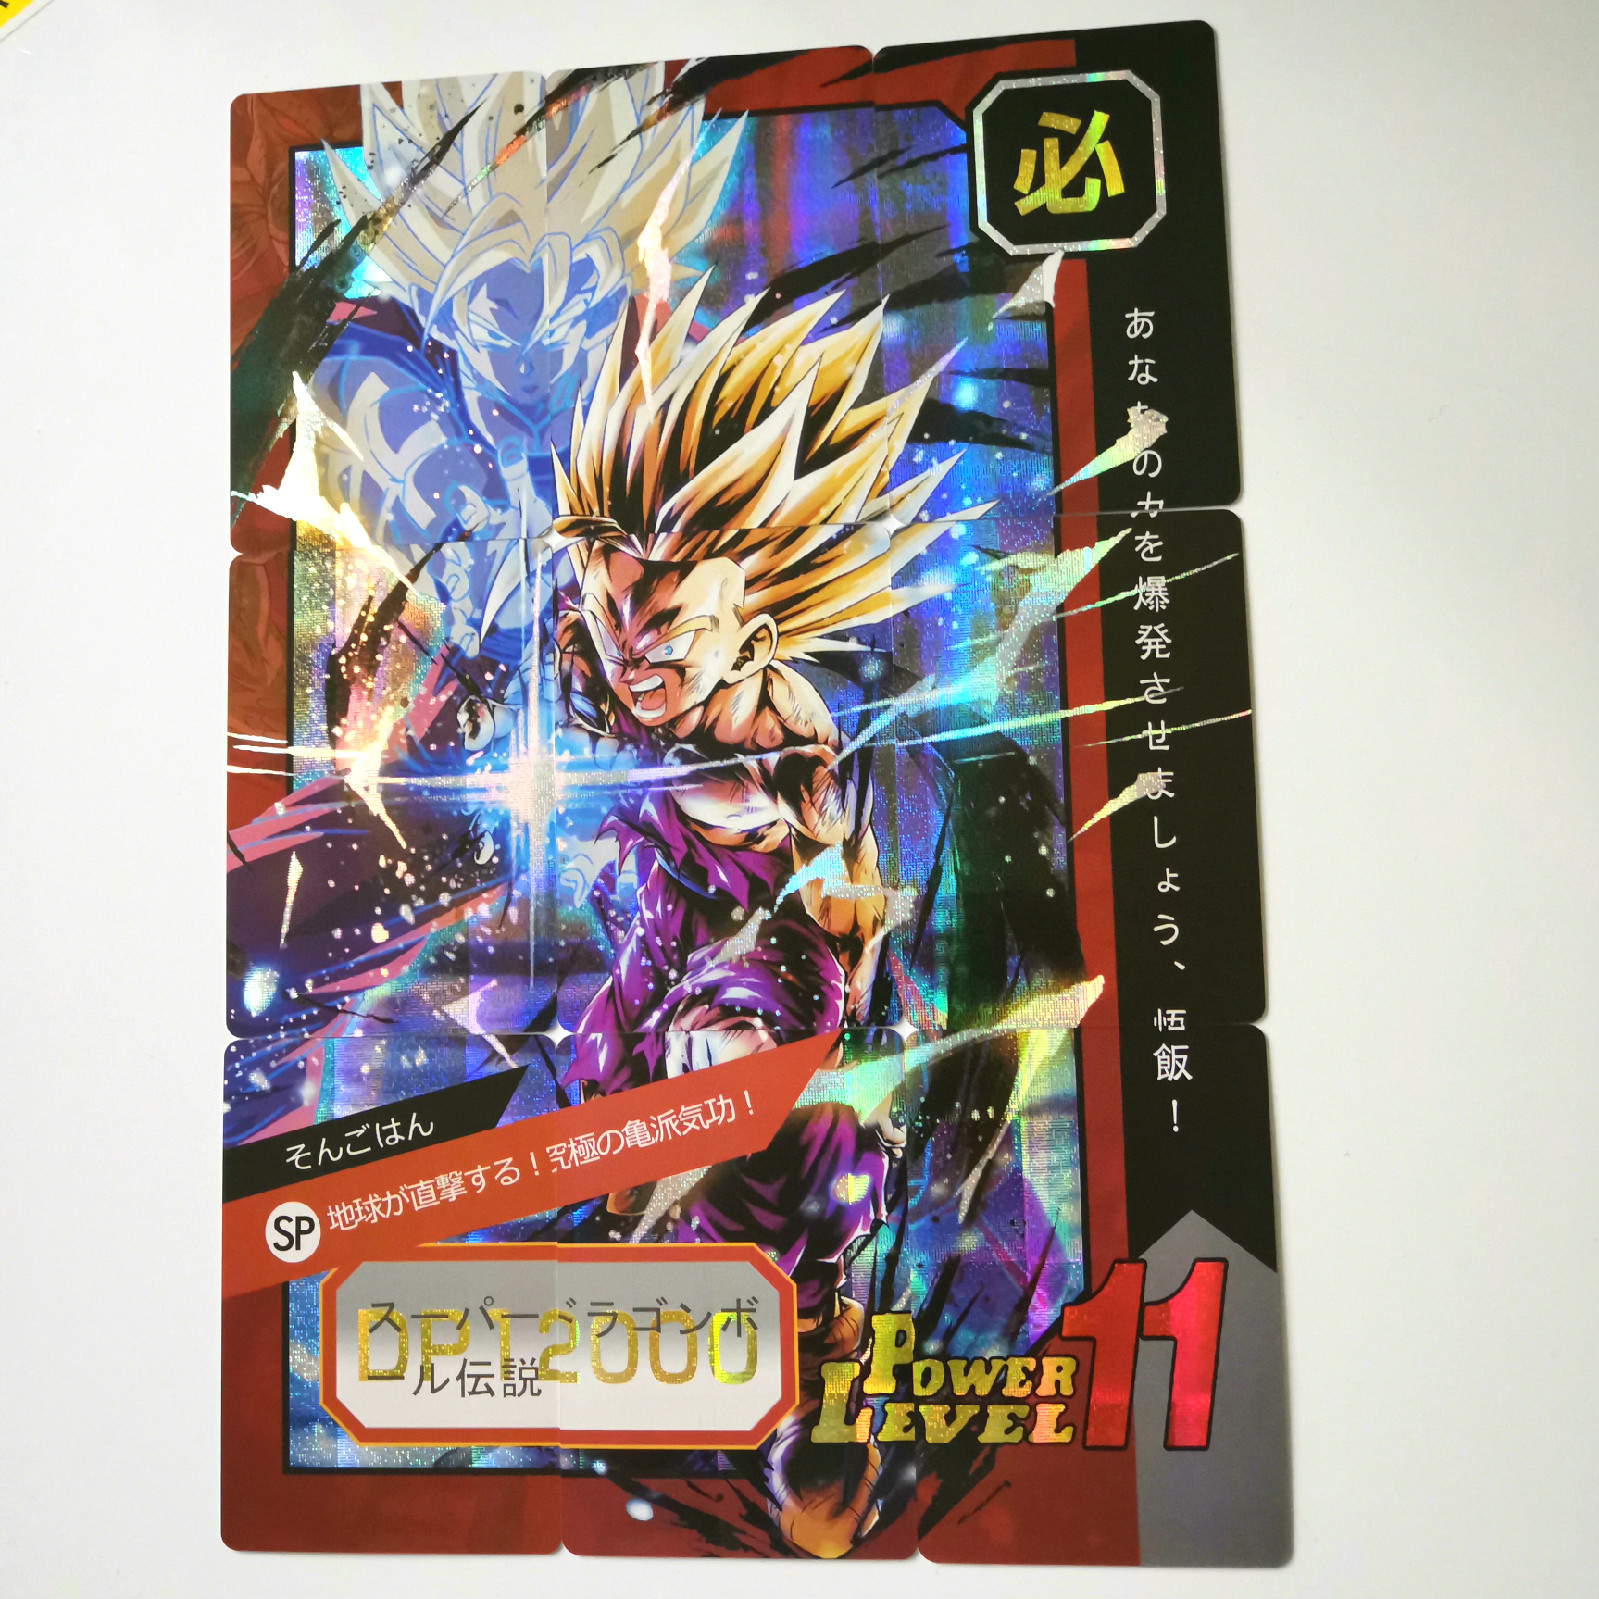 55pcs Super Dragon Ball Z 9 In 1 Heroes Battle Card Ultra Instinct Goku Vegeta Game Collection Anime Cards